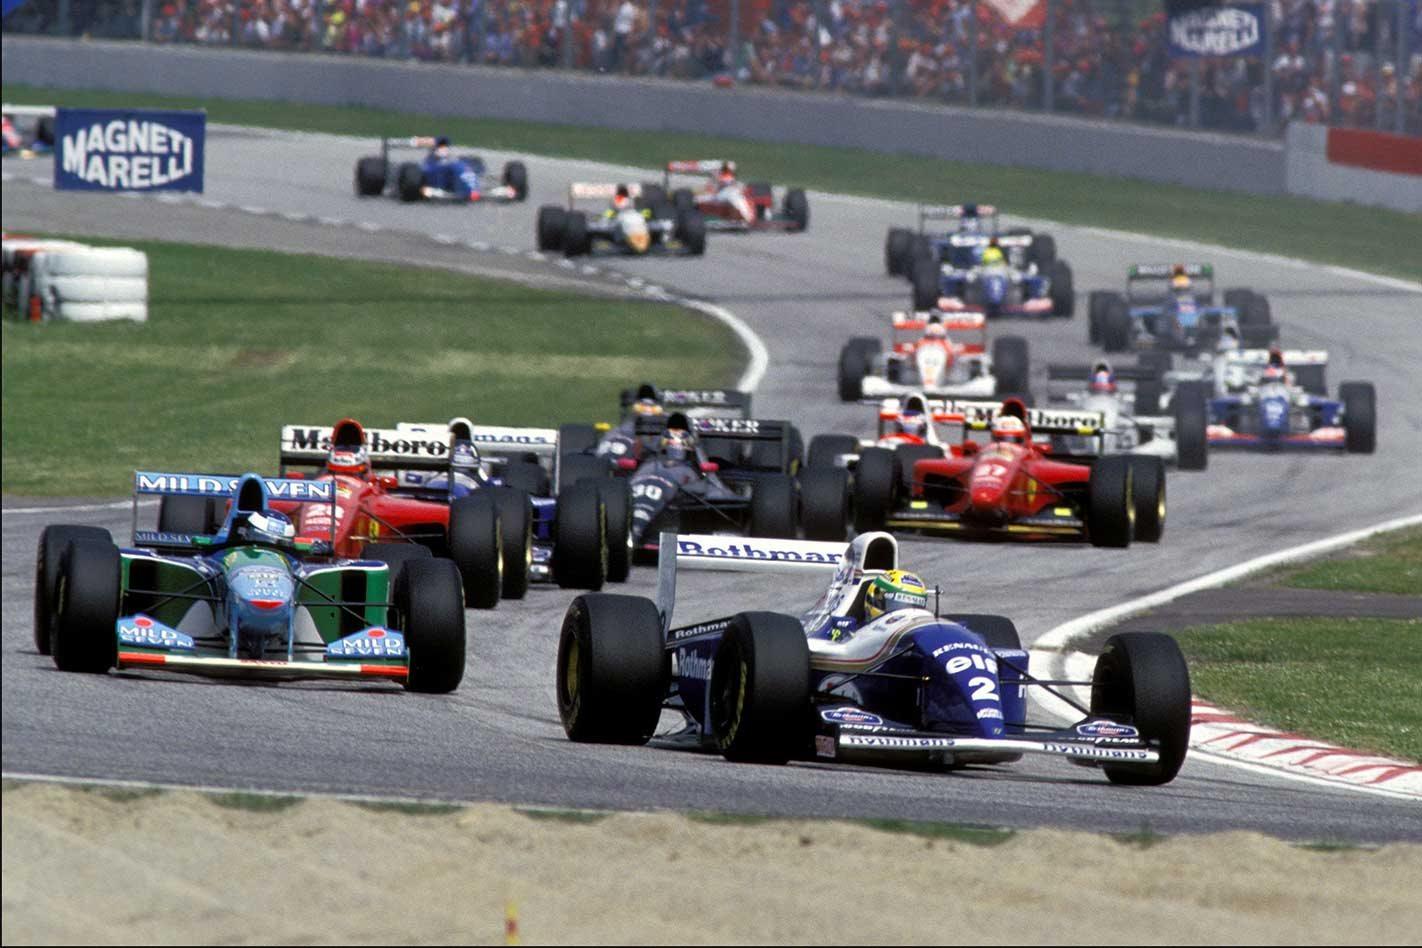 FIA finalises the 2019 Formula 1 calendar - F1 - Autosport  |Formula 1